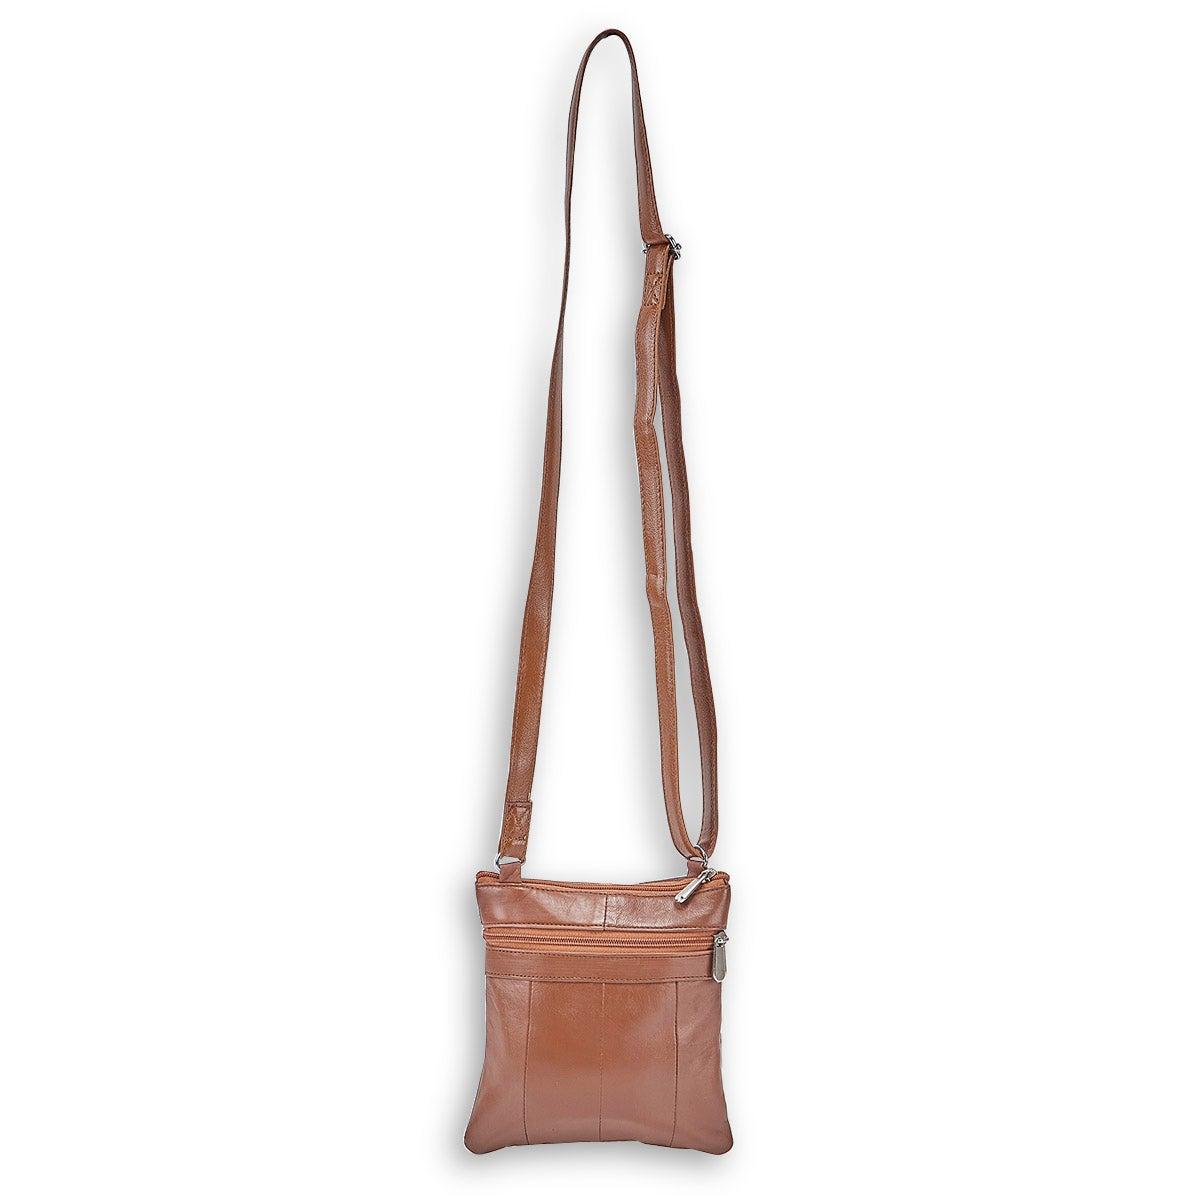 Lds tan sheep leather cross body bag